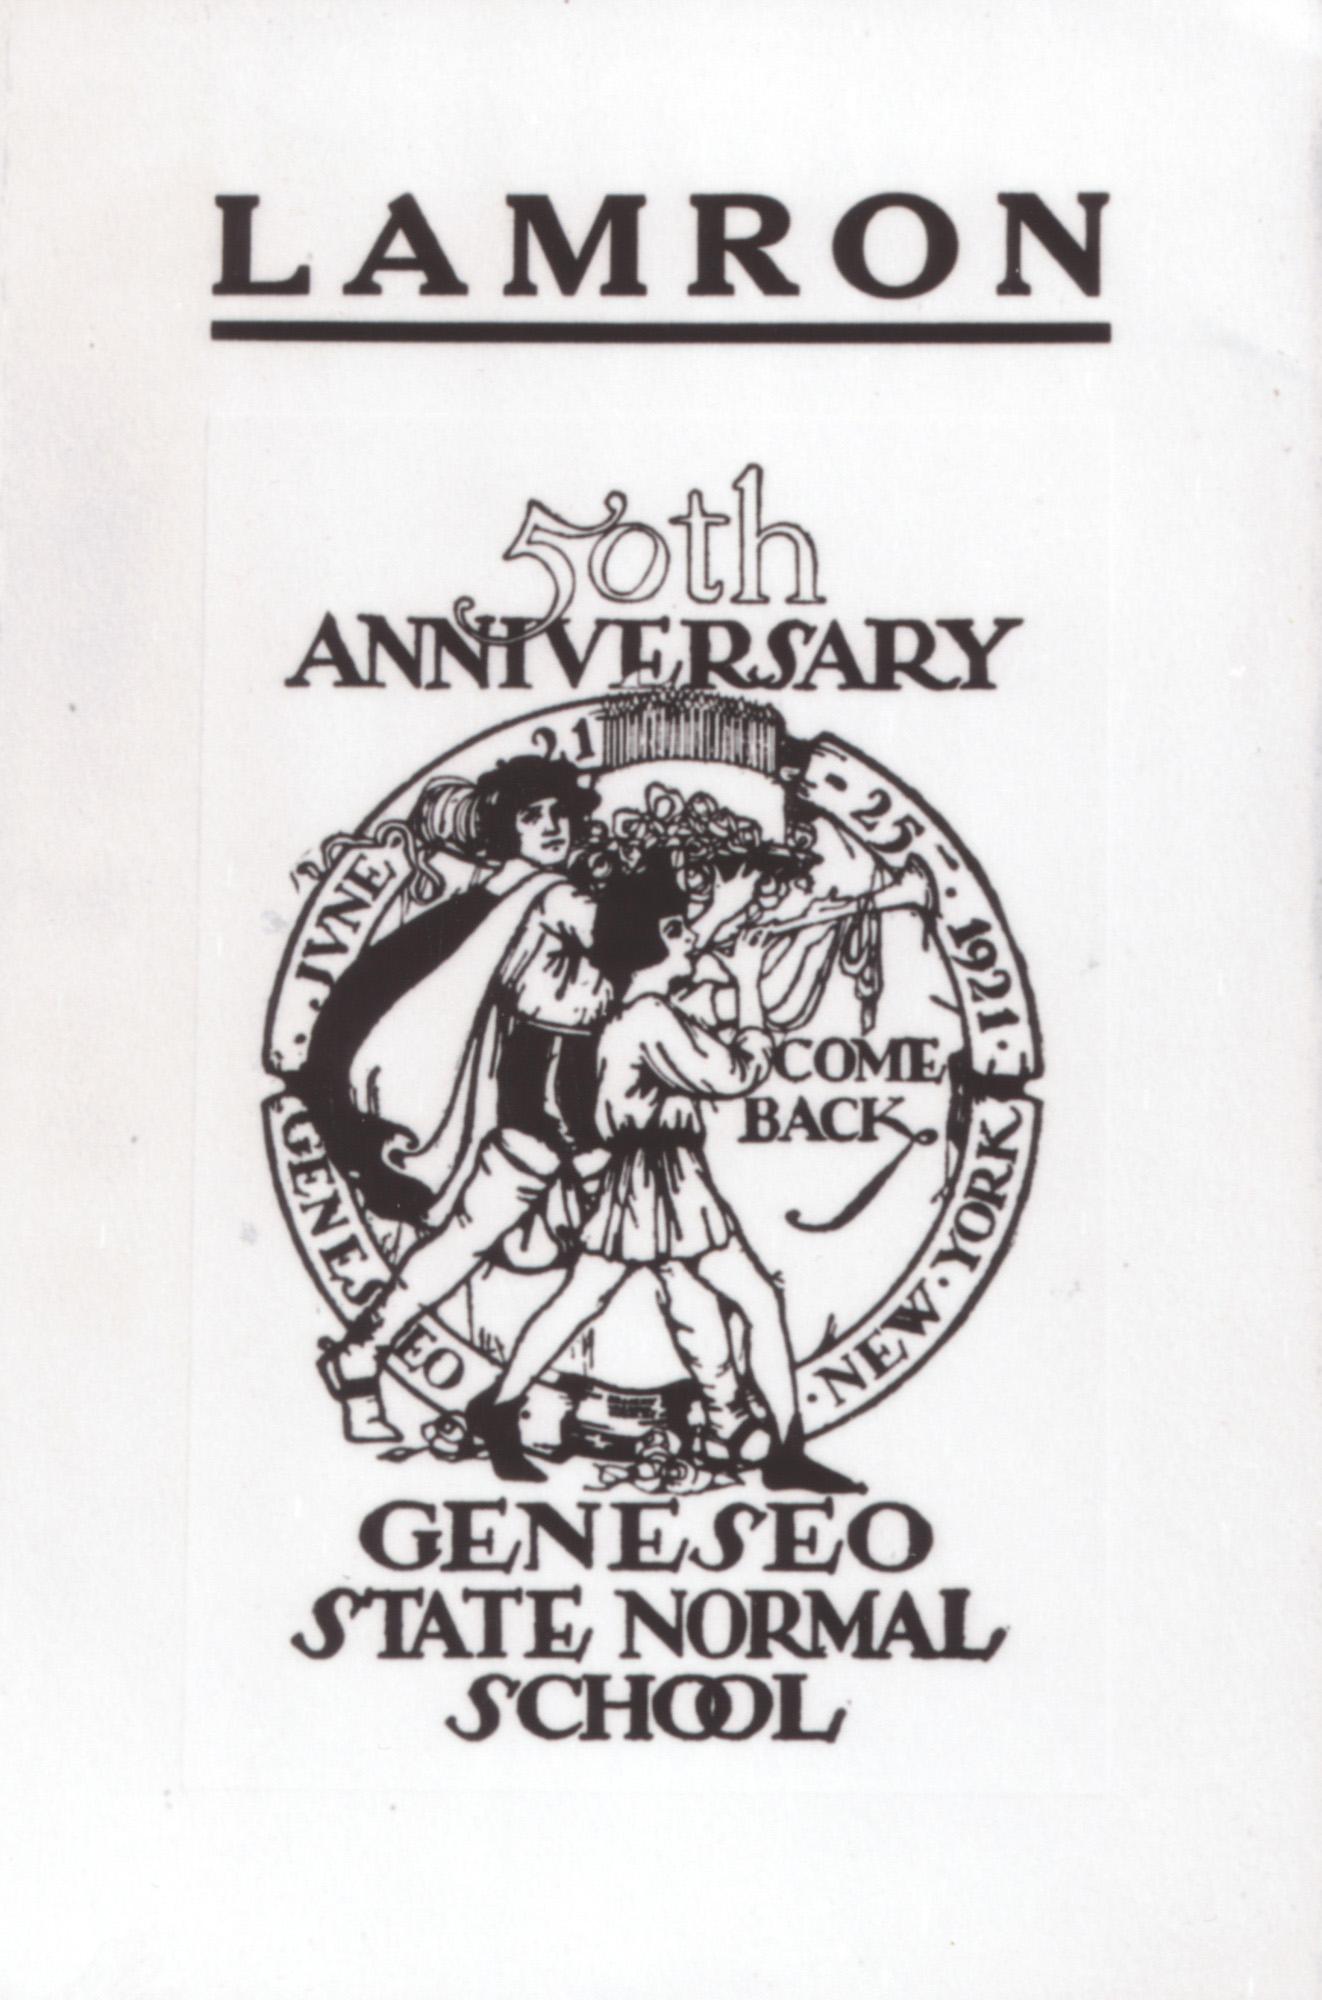 Lamron cover 50th anniversary